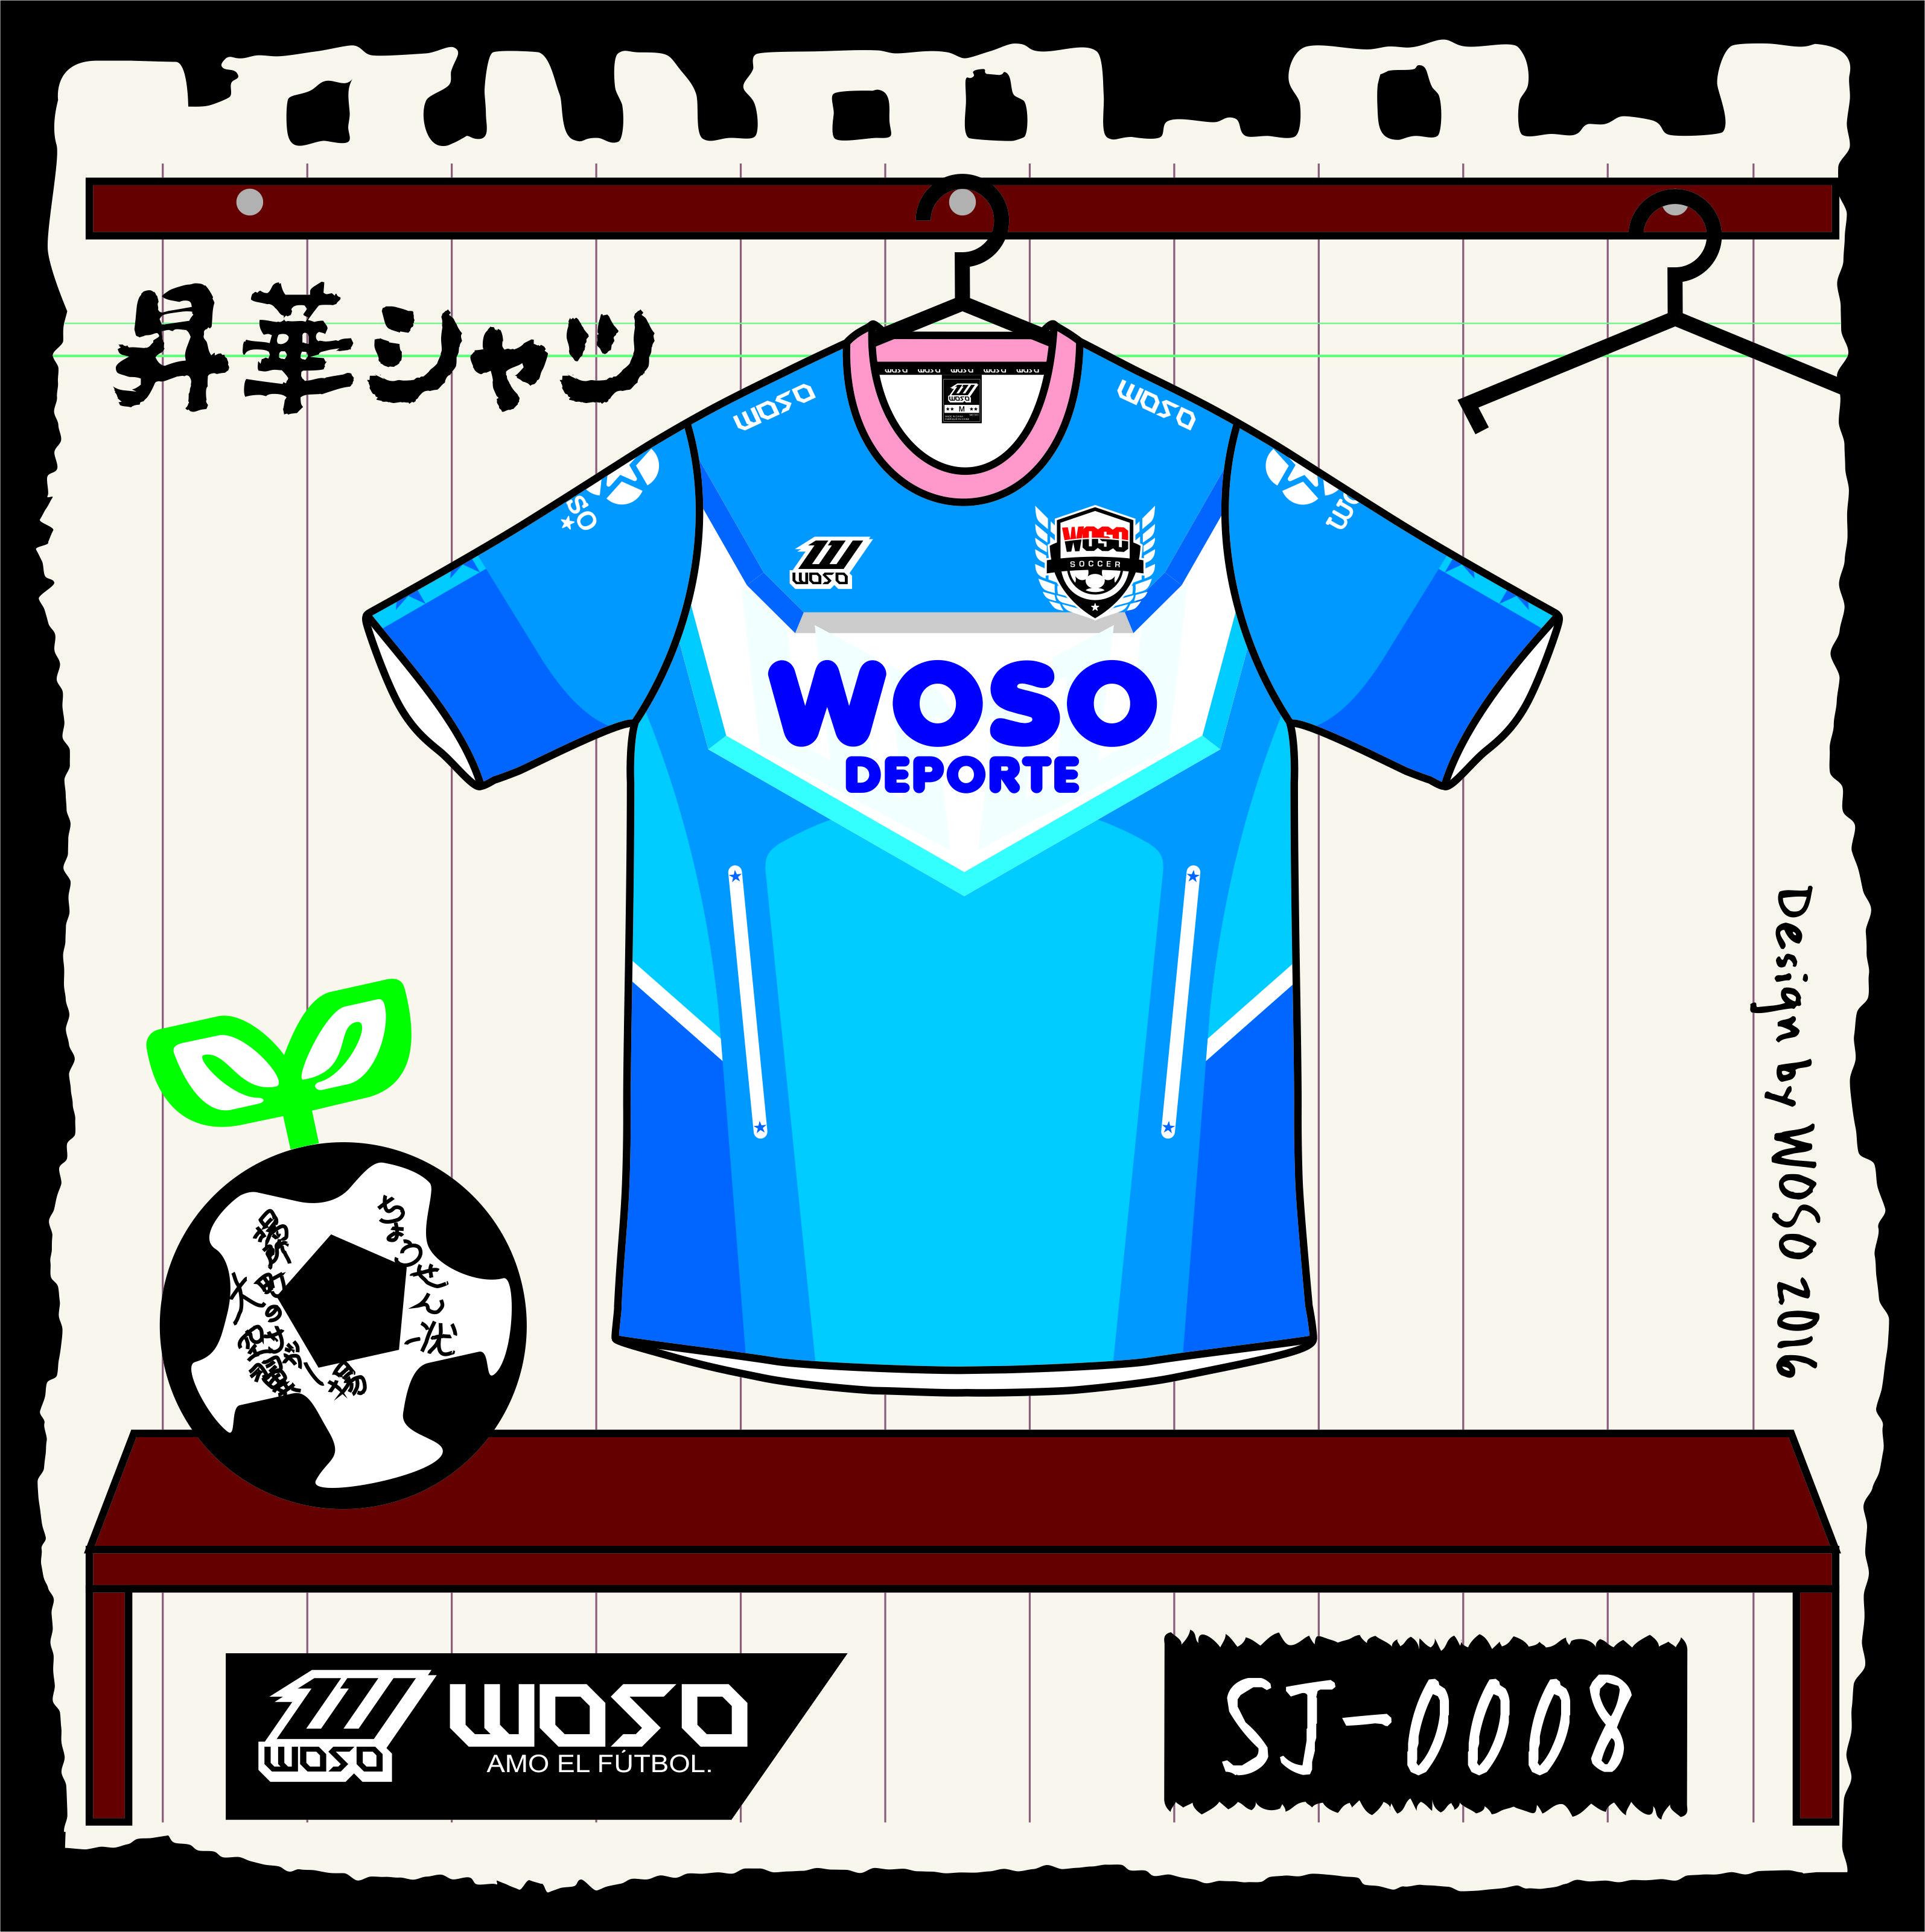 SJ-0008